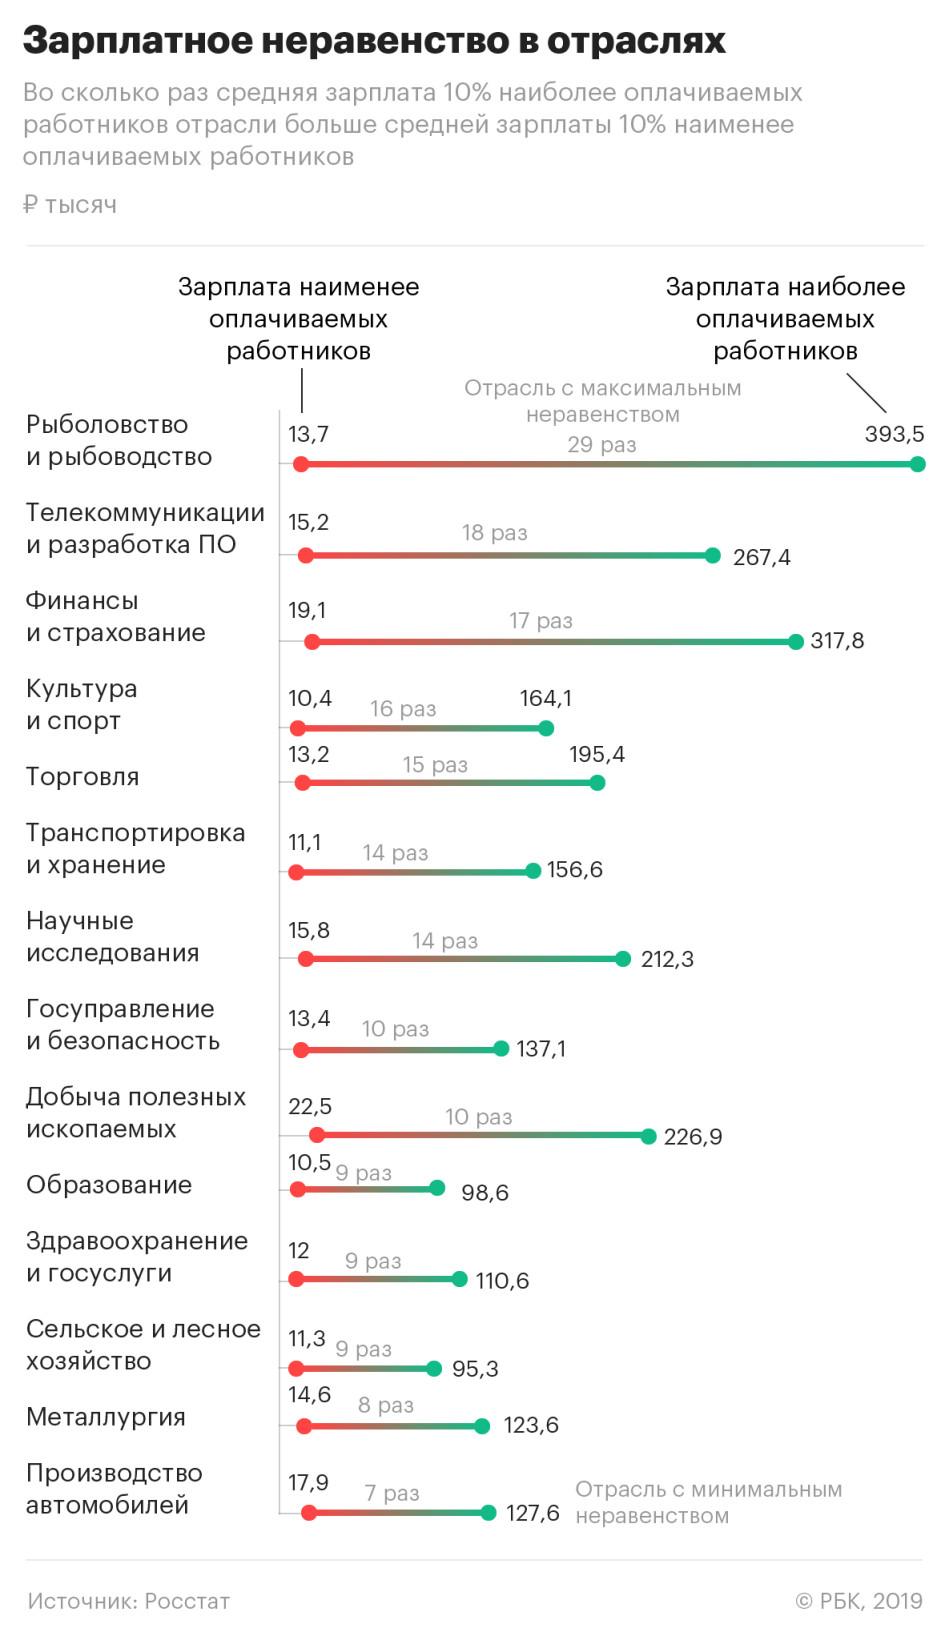 https://s0.rbk.ru/v6_top_pics/resized/945xH/media/img/6/20/755635620598206.jpeg